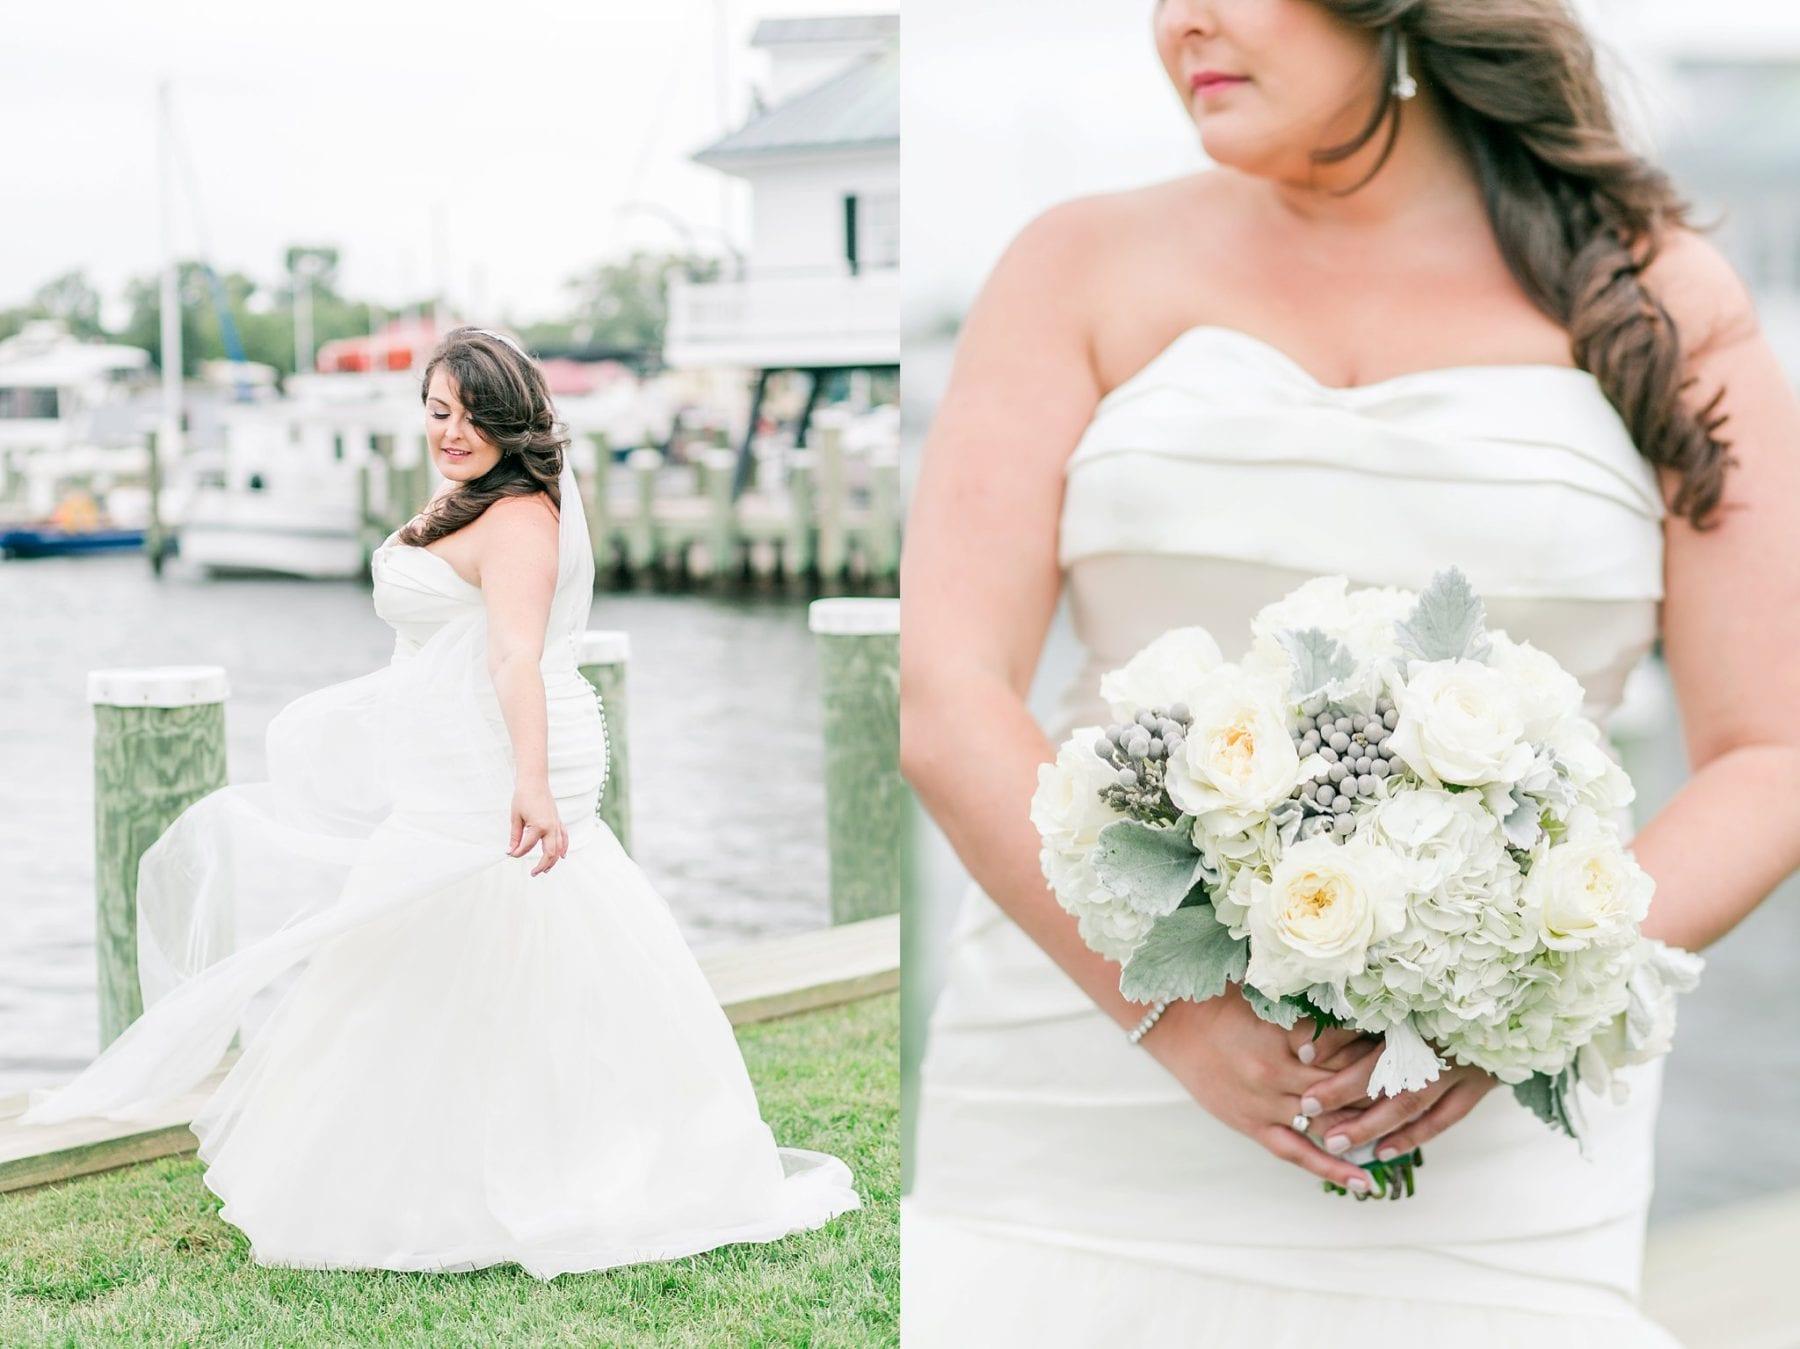 Chesapeake Bay Maritime Museum Wedding Photos Maryland Wedding Photographer Megan Kelsey Photography Halie & Mike-90.jpg